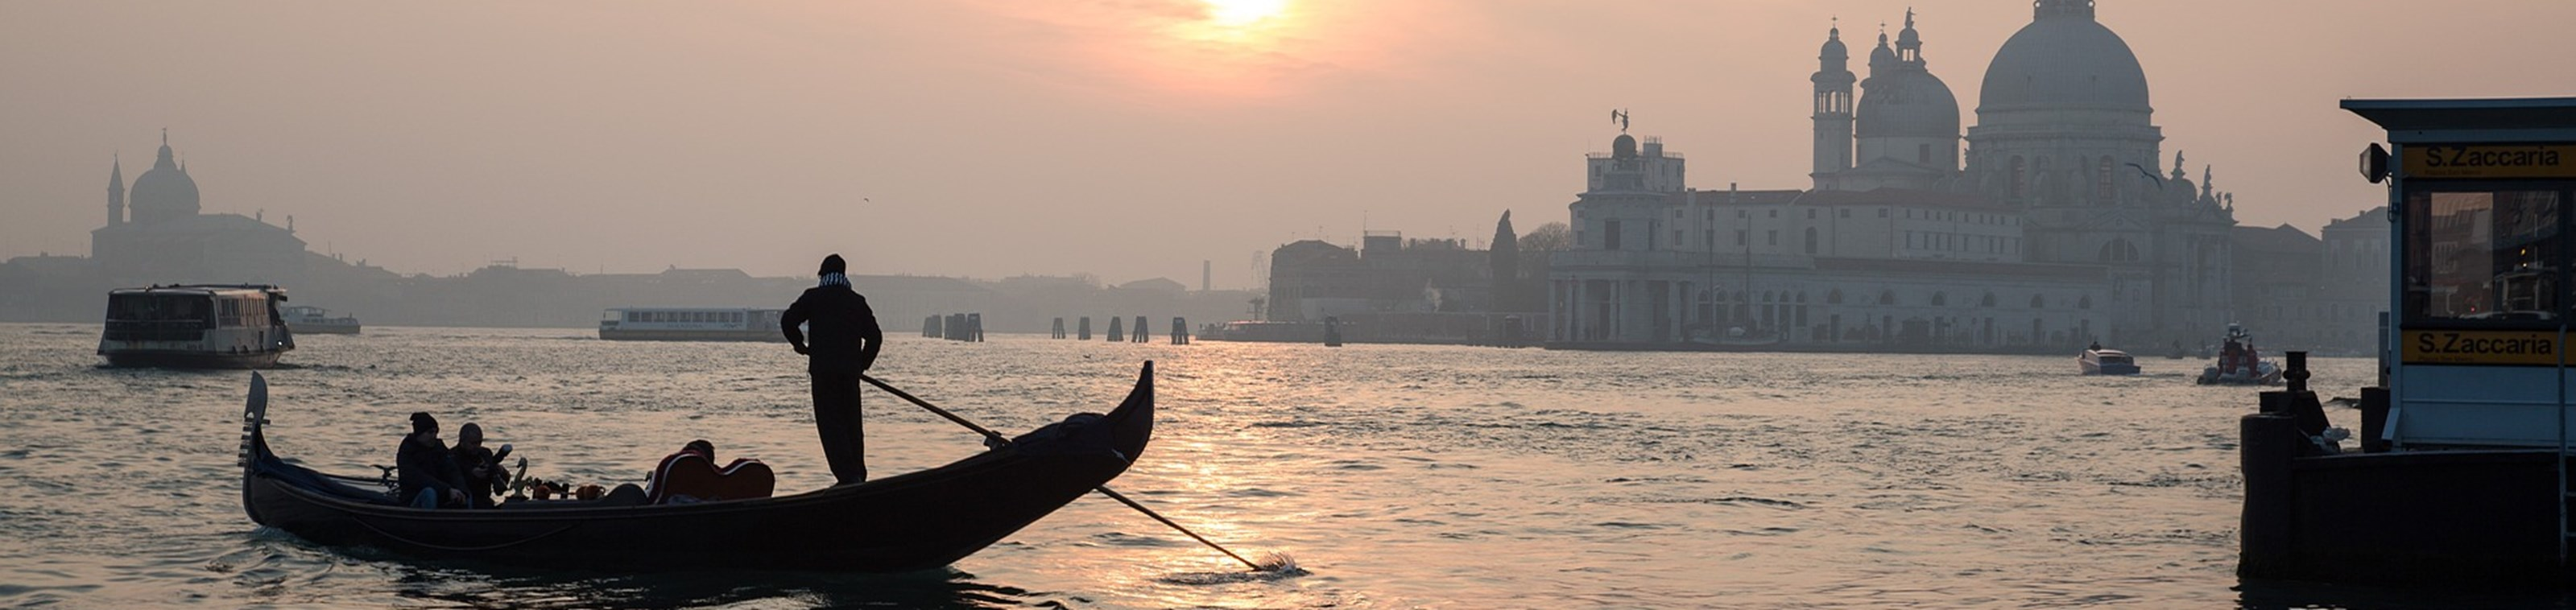 Citytripcruise Venetië